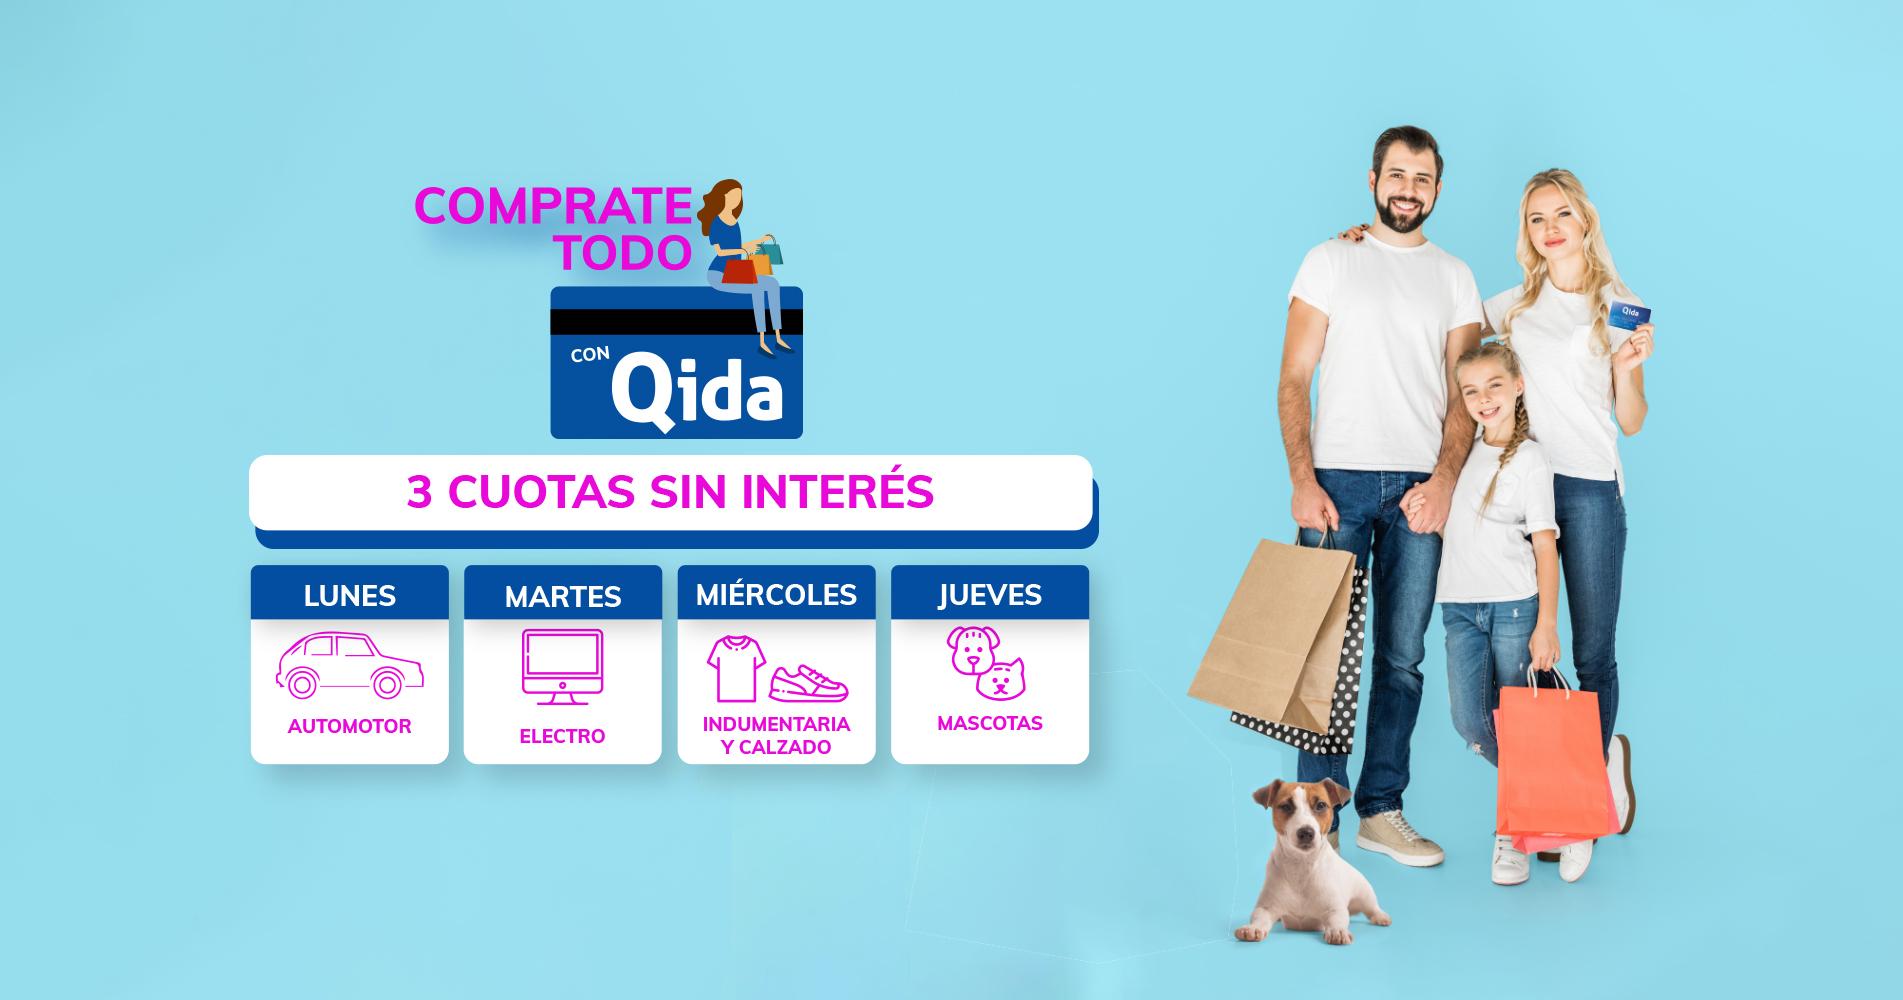 Comprate todo con Qida